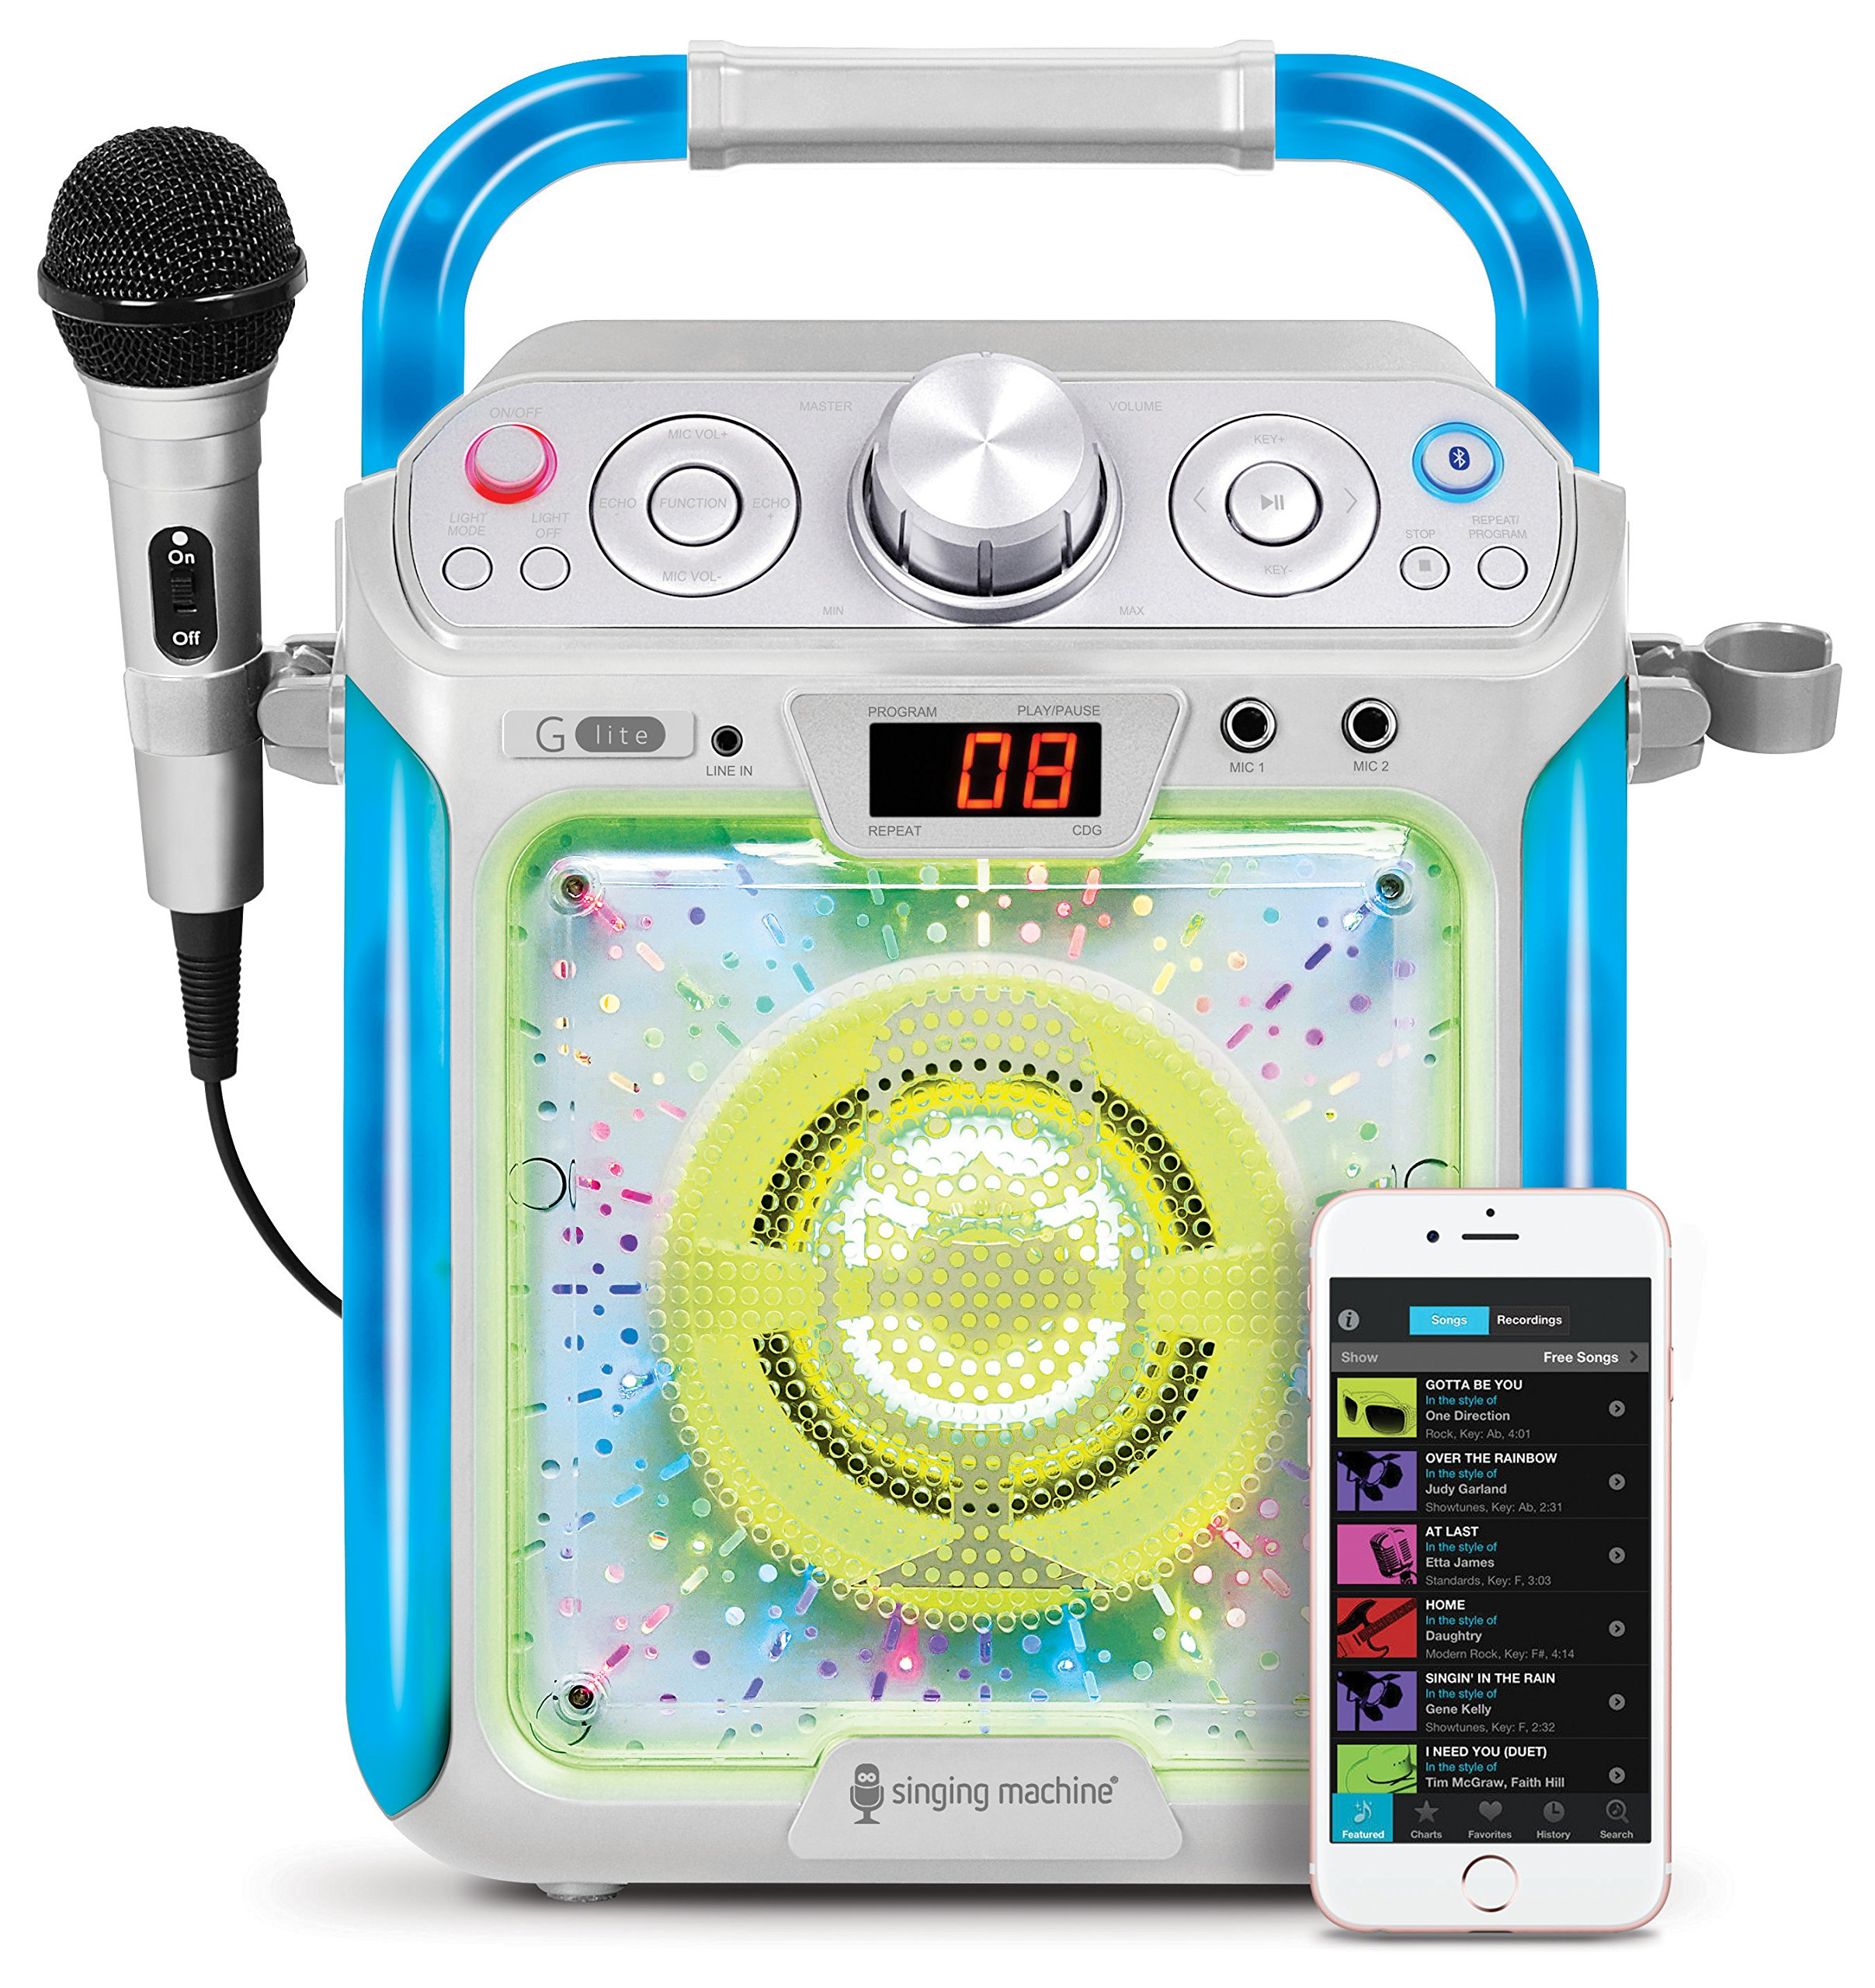 Singing Machine SML2082BTC Bluetooth G-Lite CD+G Karaoke System